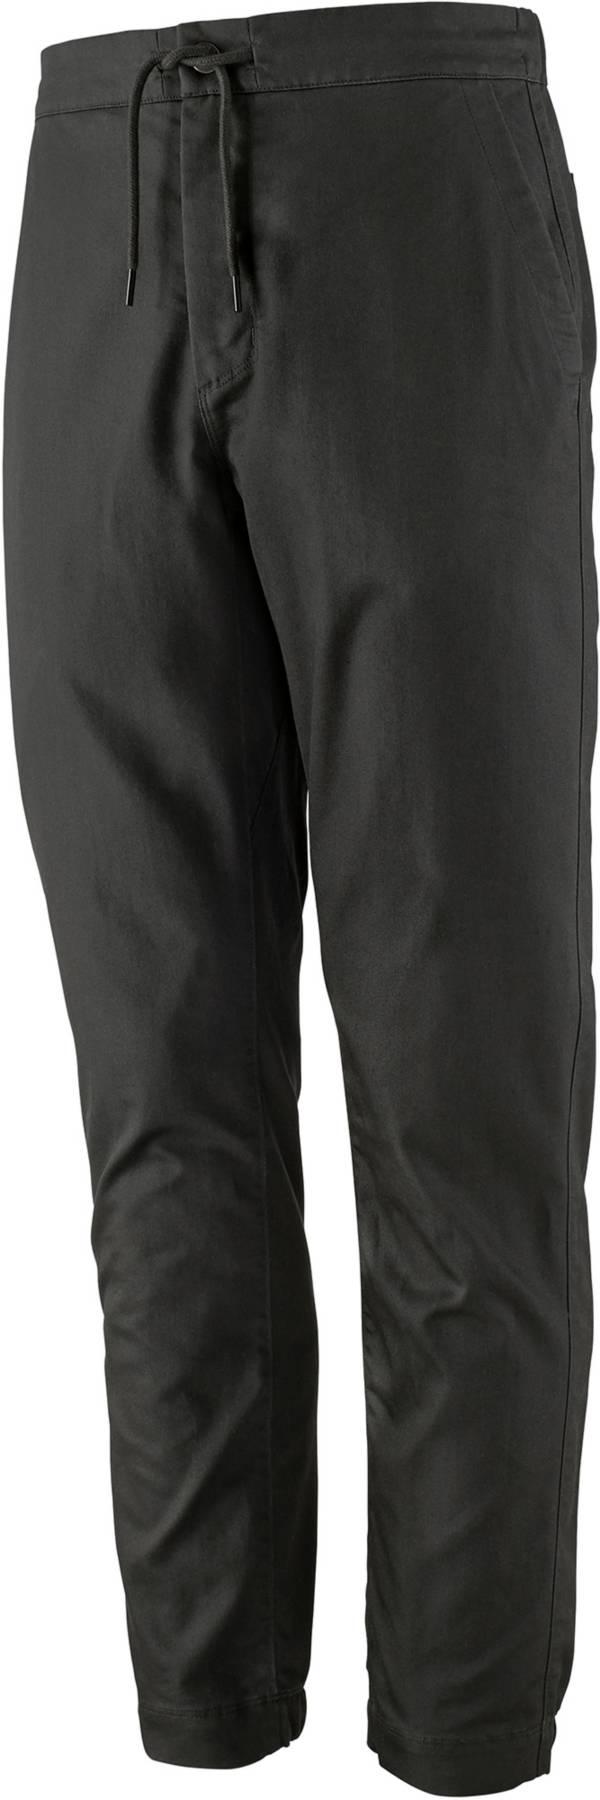 Patagonia Men's Twill Traveler Pants product image